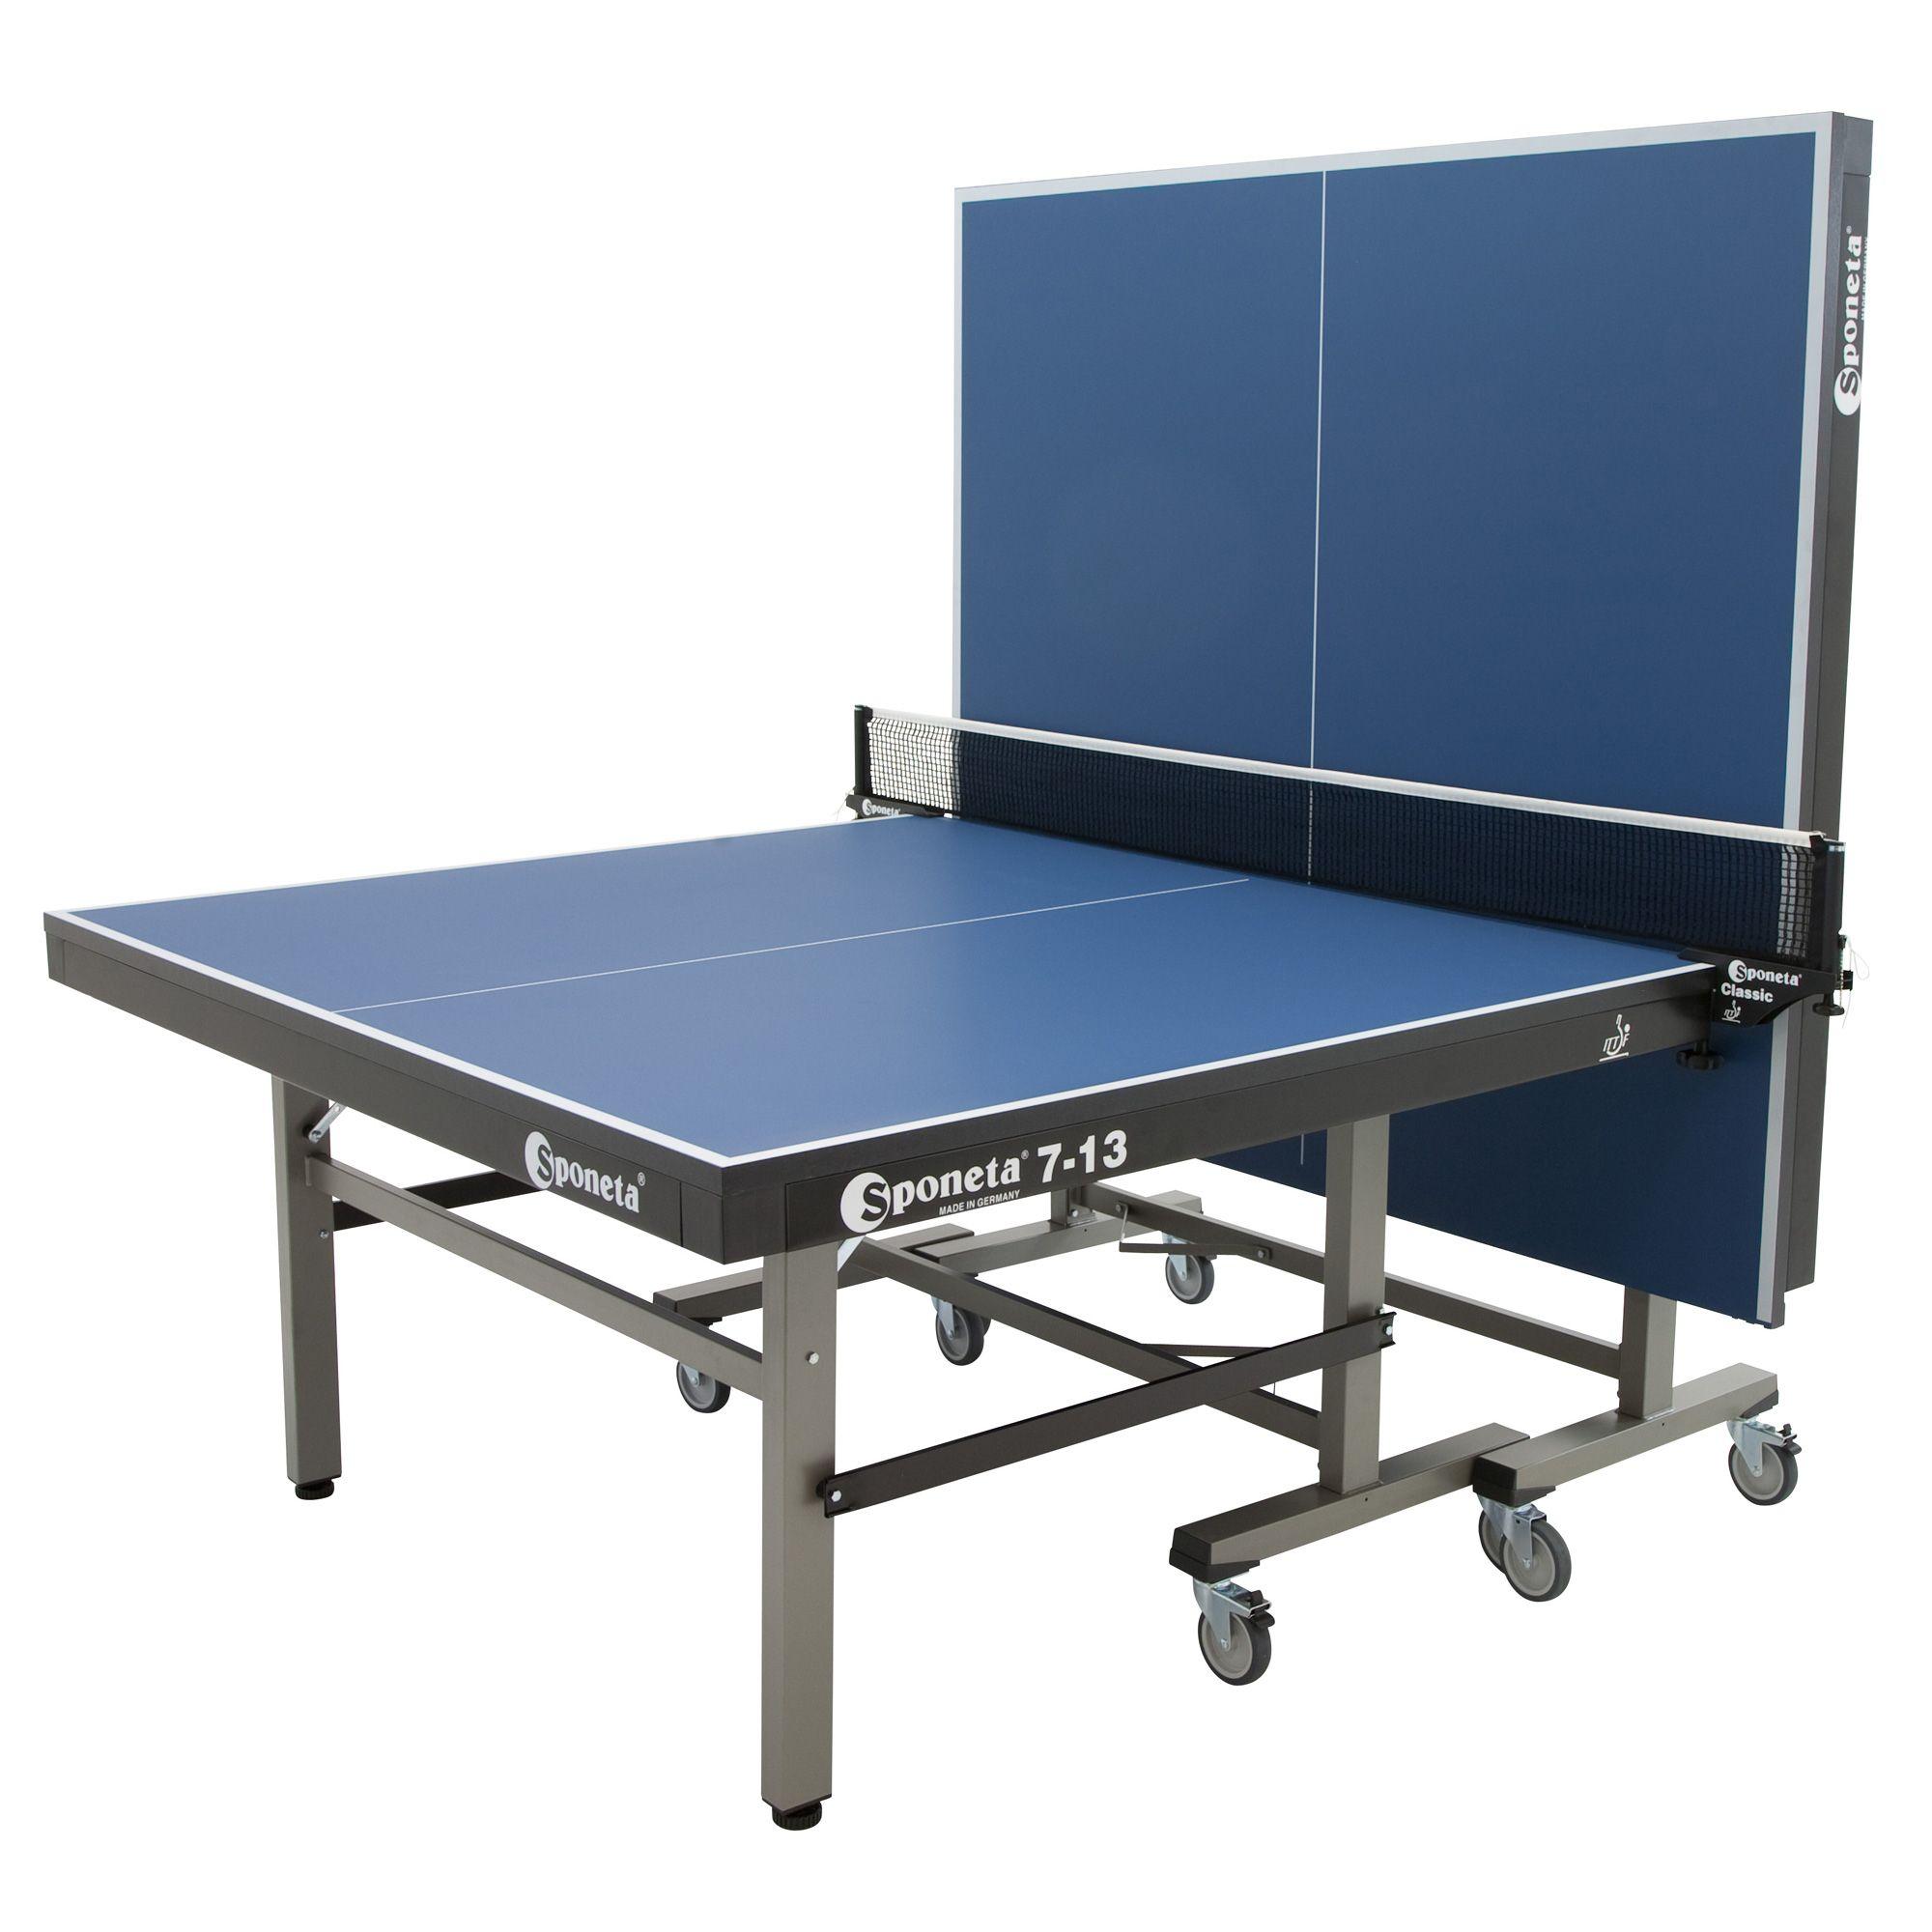 Sponeta master compact ittf indoor table tennis table - Sponeta table tennis table ...